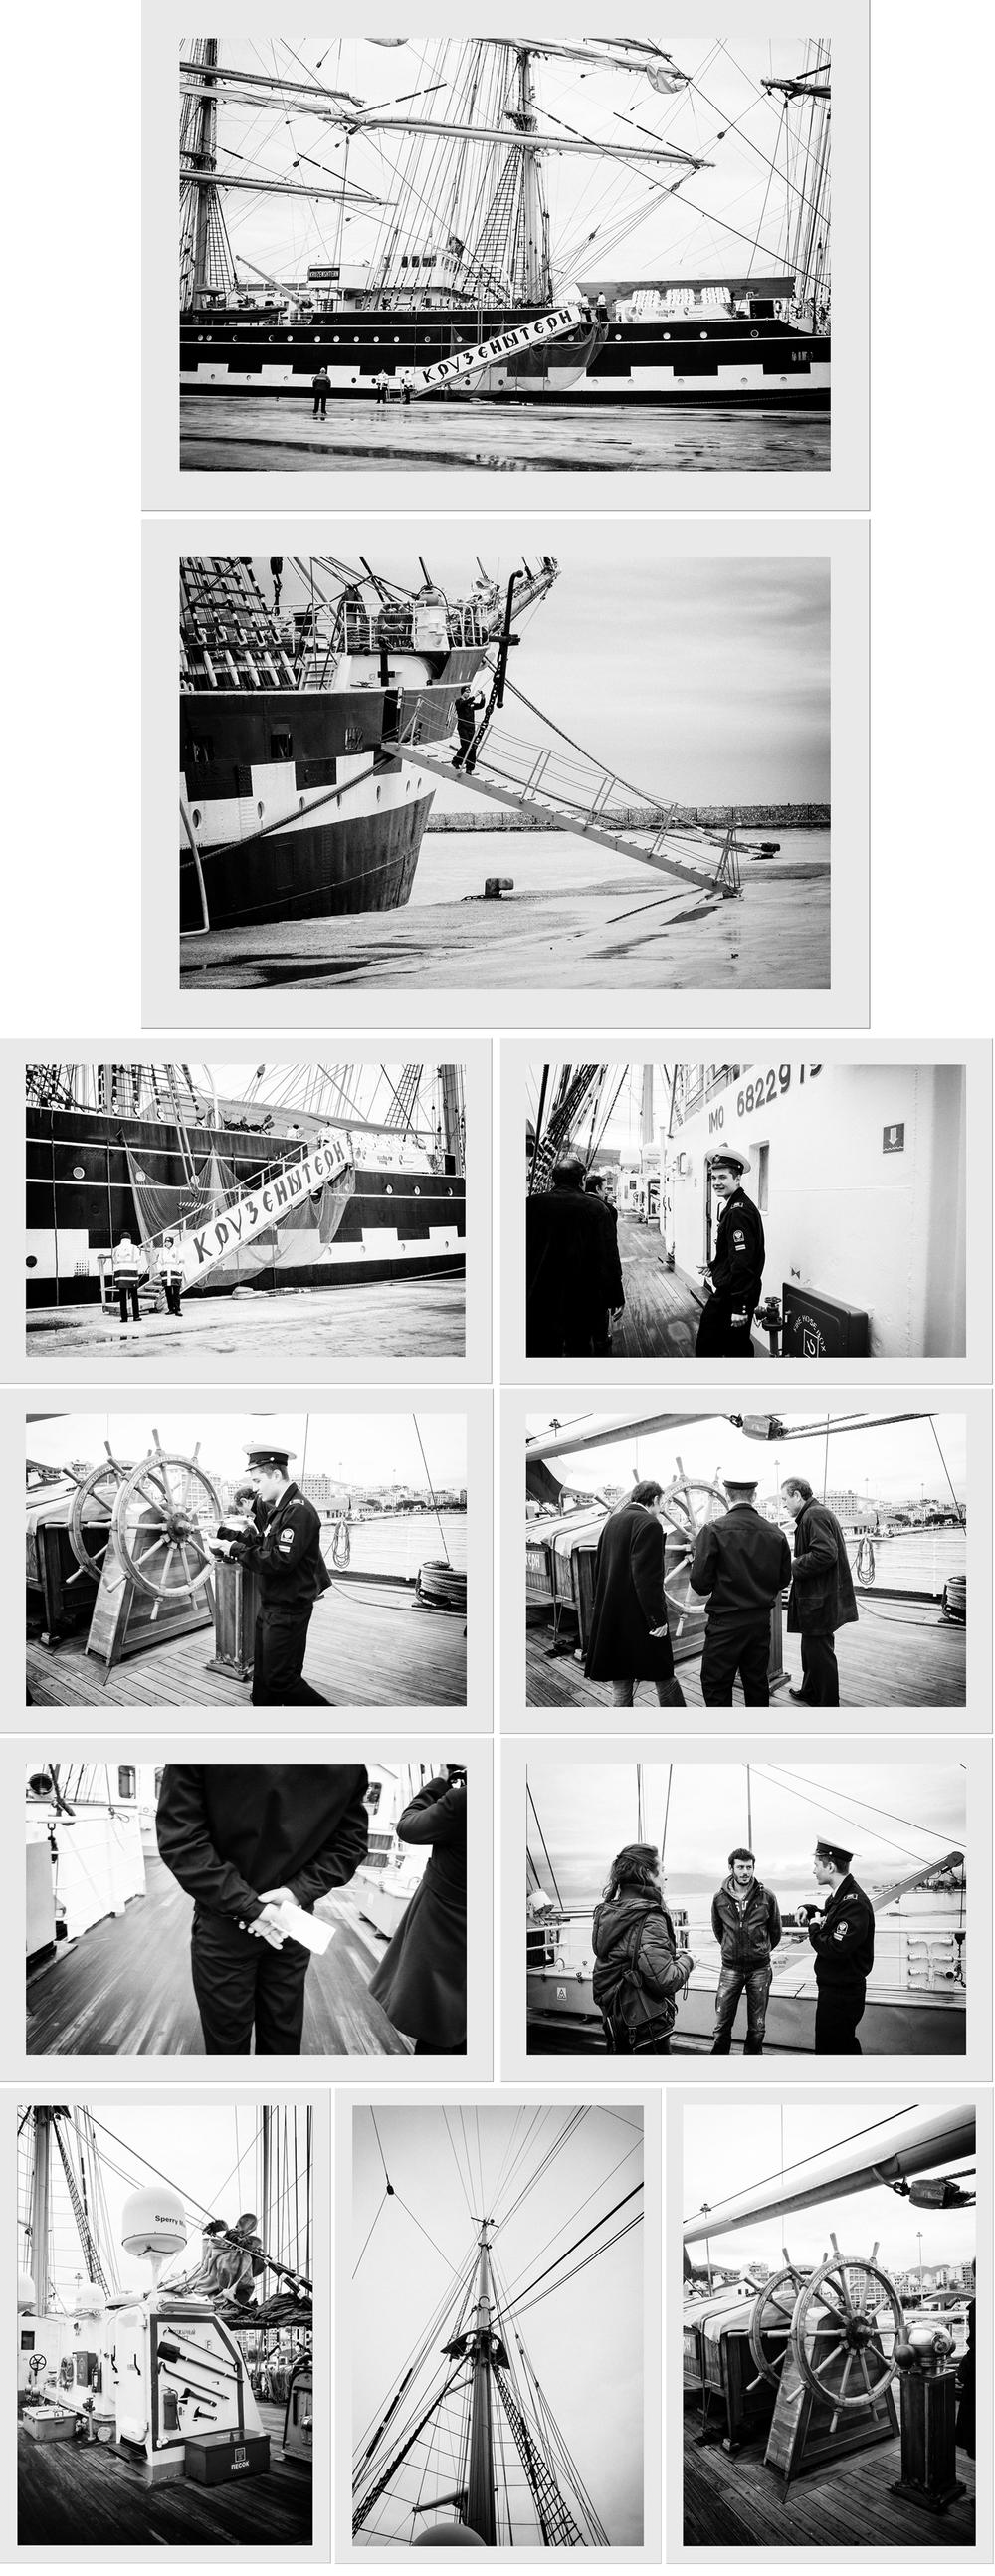 IOANNIS ANDRIOPOULOS PHOTOGRAPHY KRUZENSHTERN PATRA GREECE